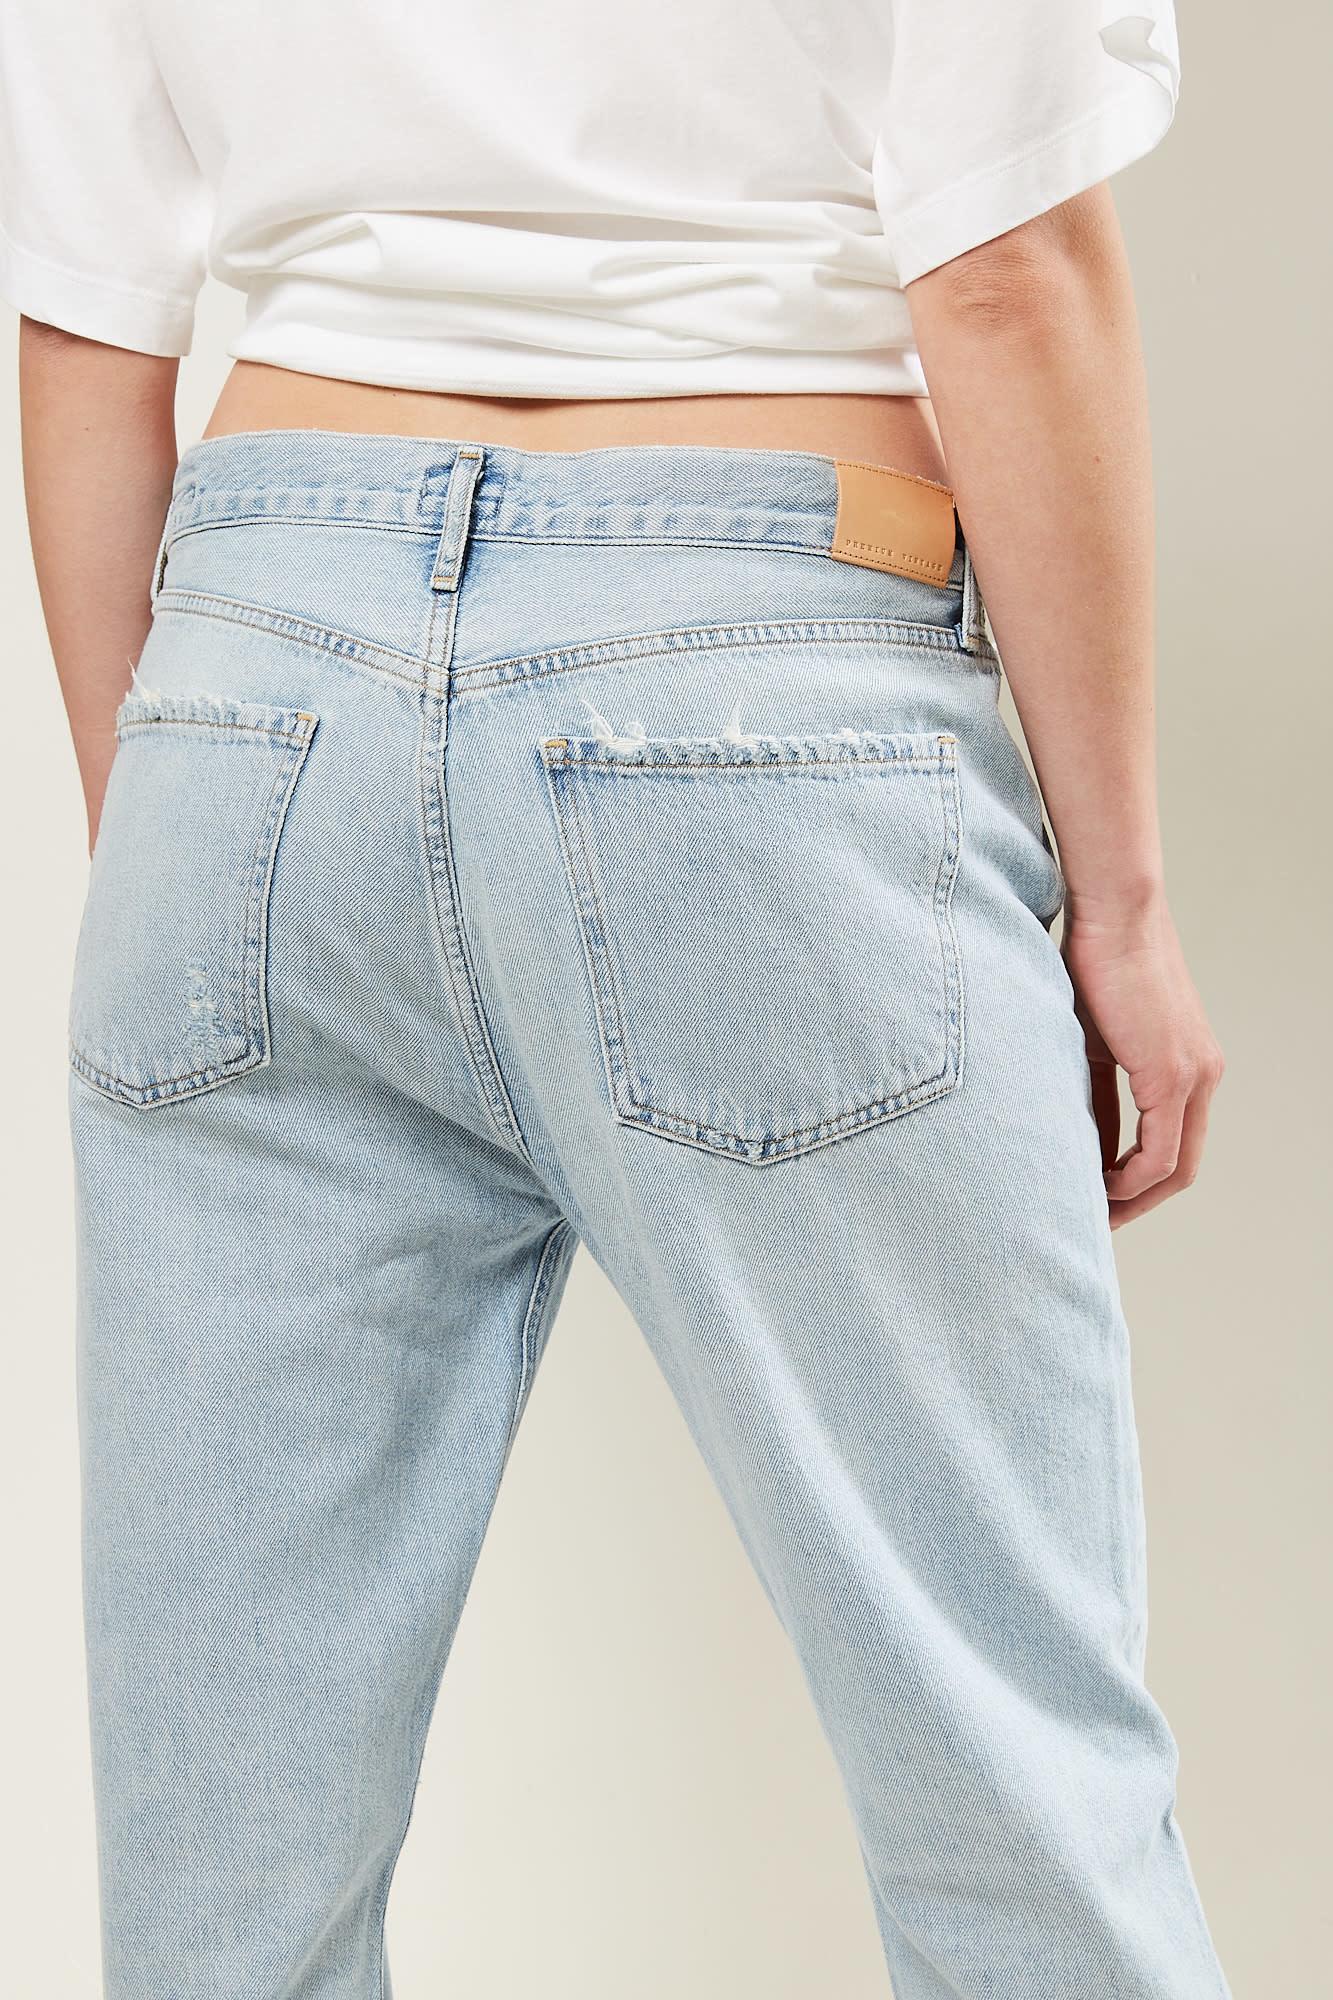 Citizens of Humanity Charlotte la luna jeans